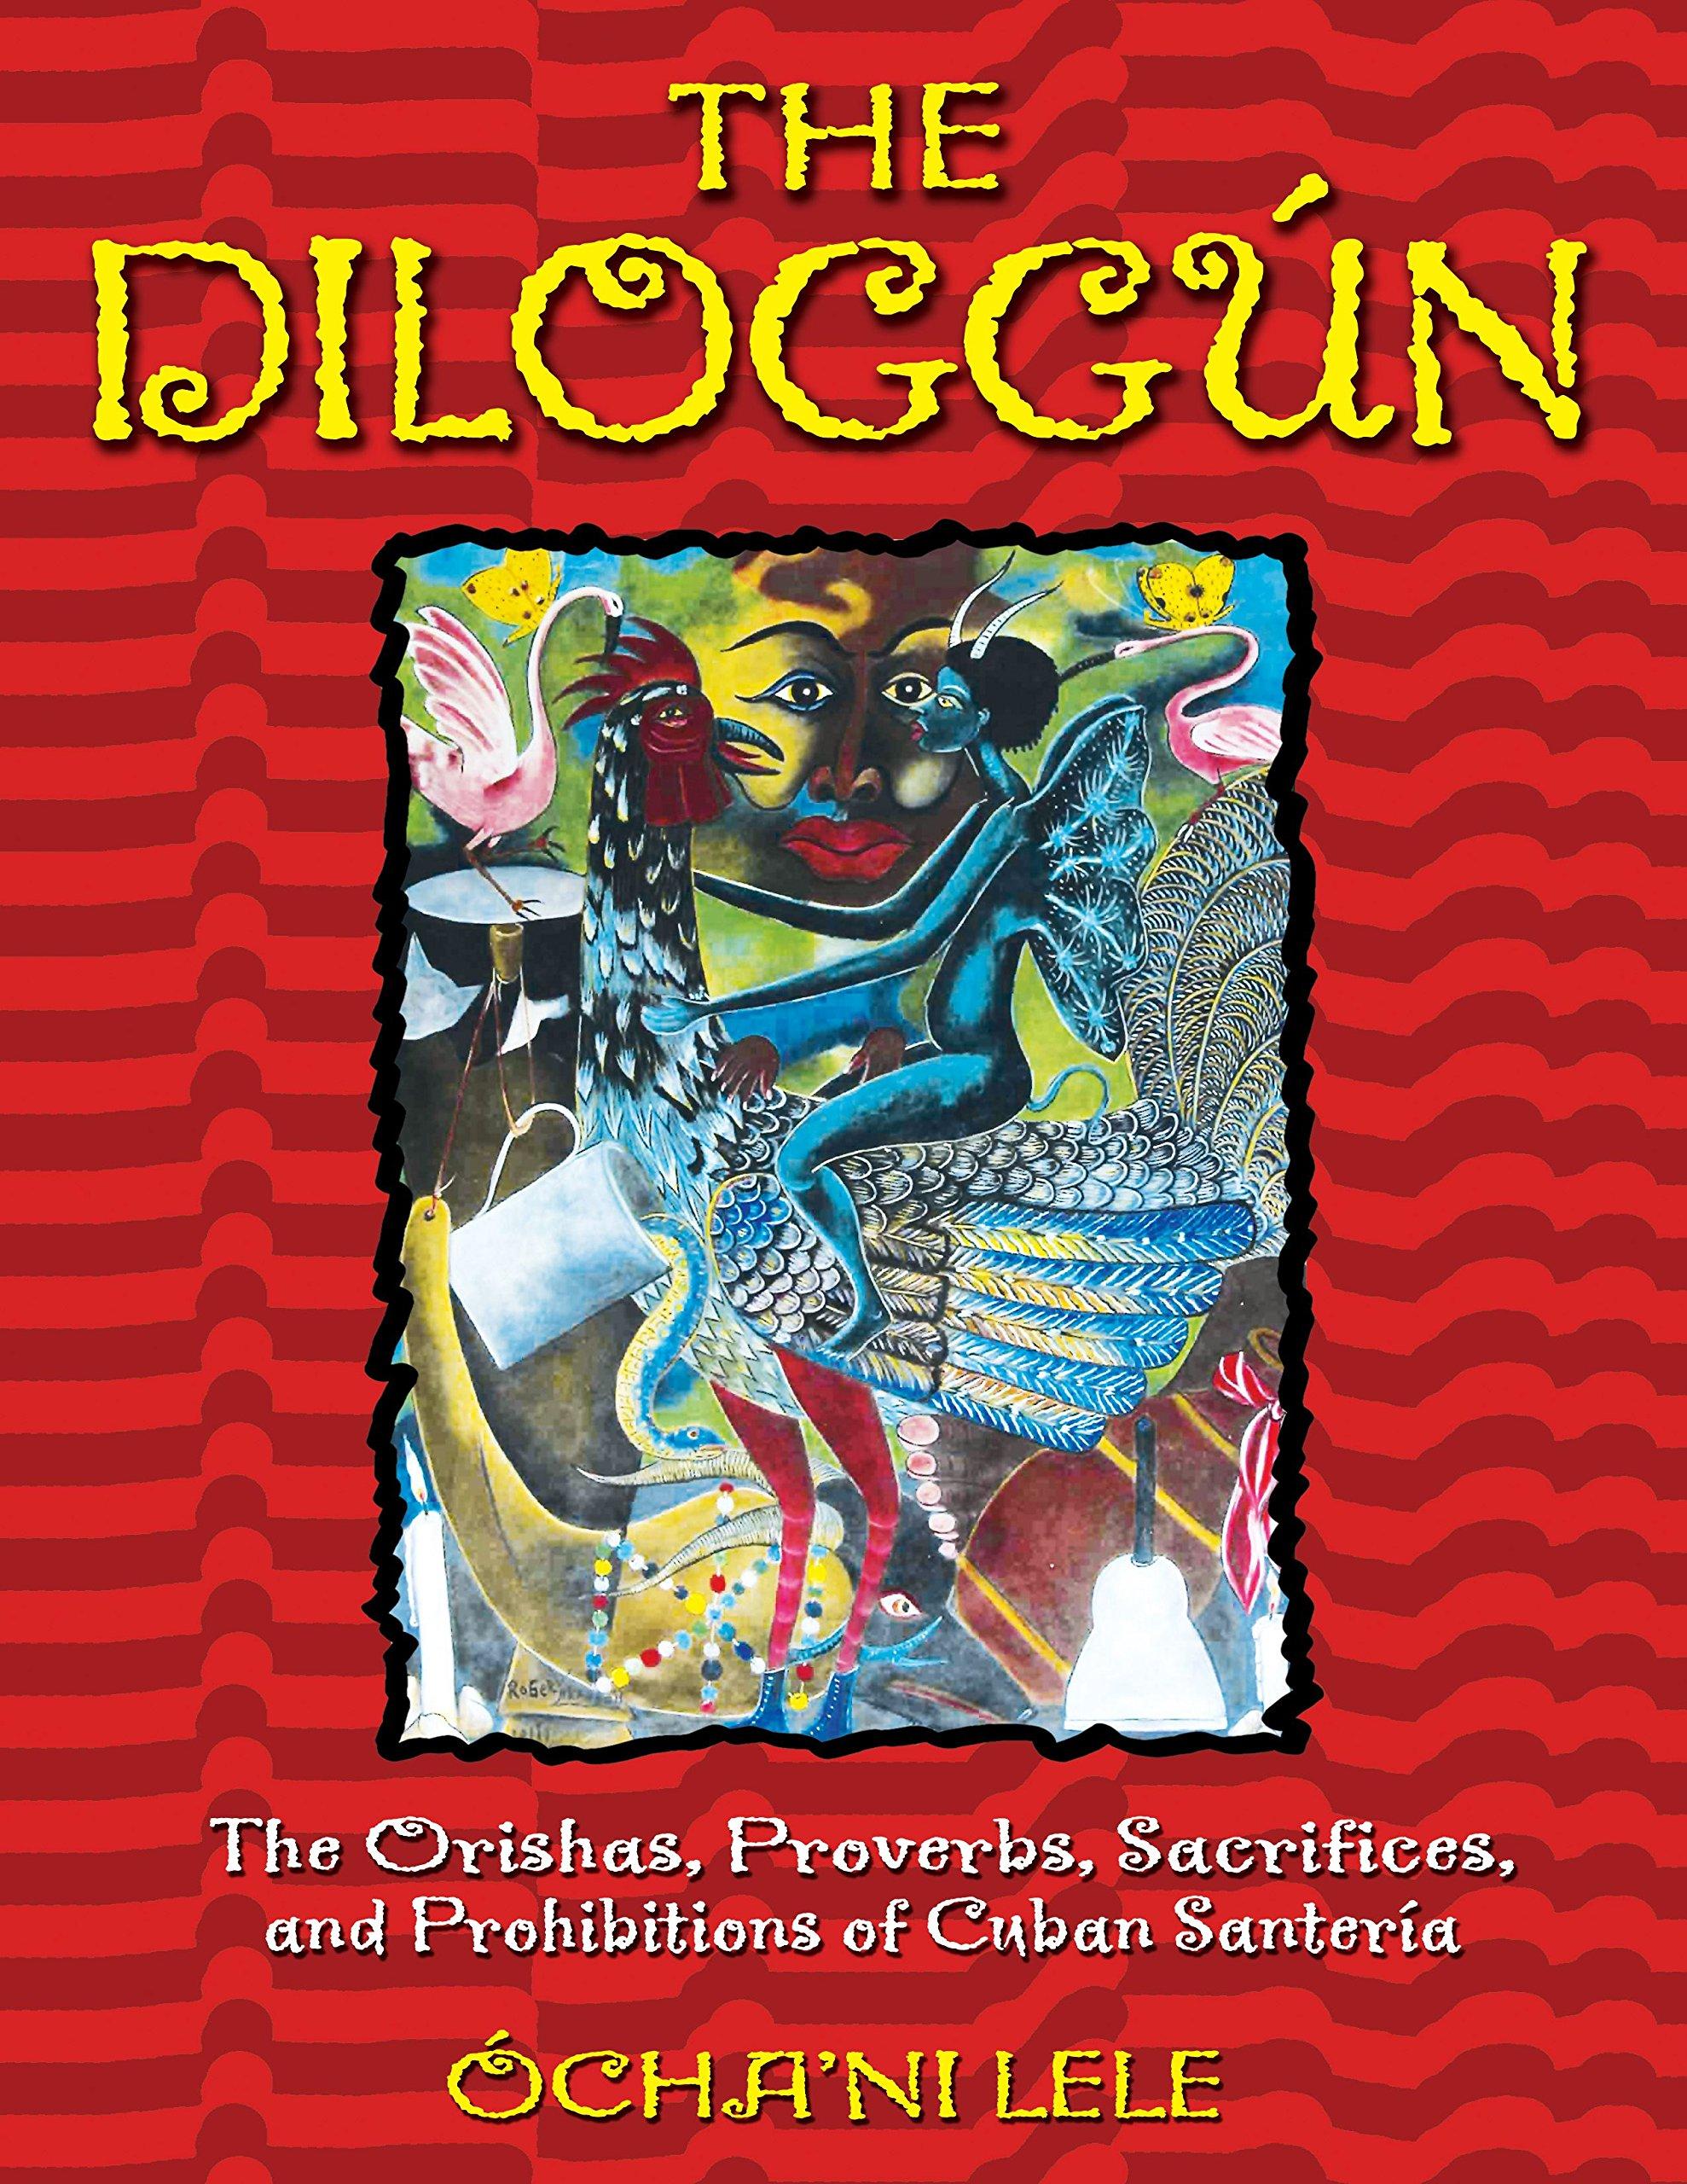 The Diloggun: The Orishas, Proverbs, Sacrifices, and Prohibitions of Cuban Santeria by Destiny Books